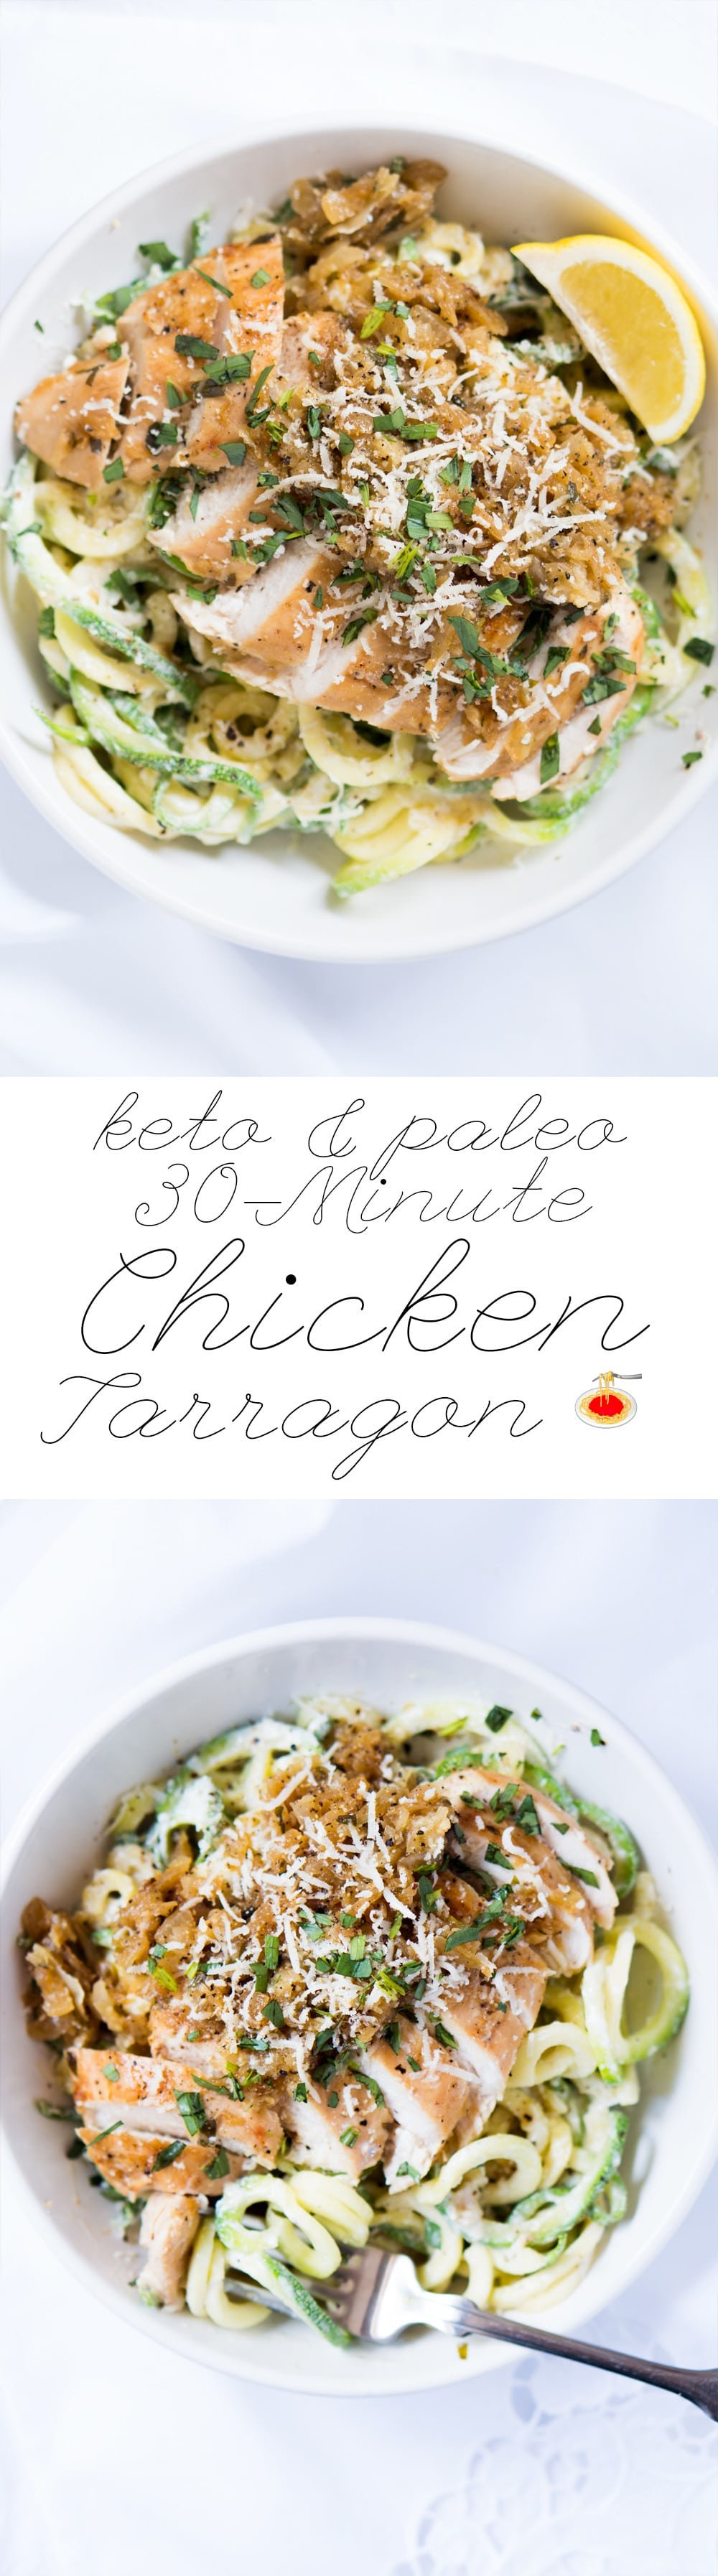 30-Minute Paleo & Keto Chicken Tarragon Zoodles 🍗